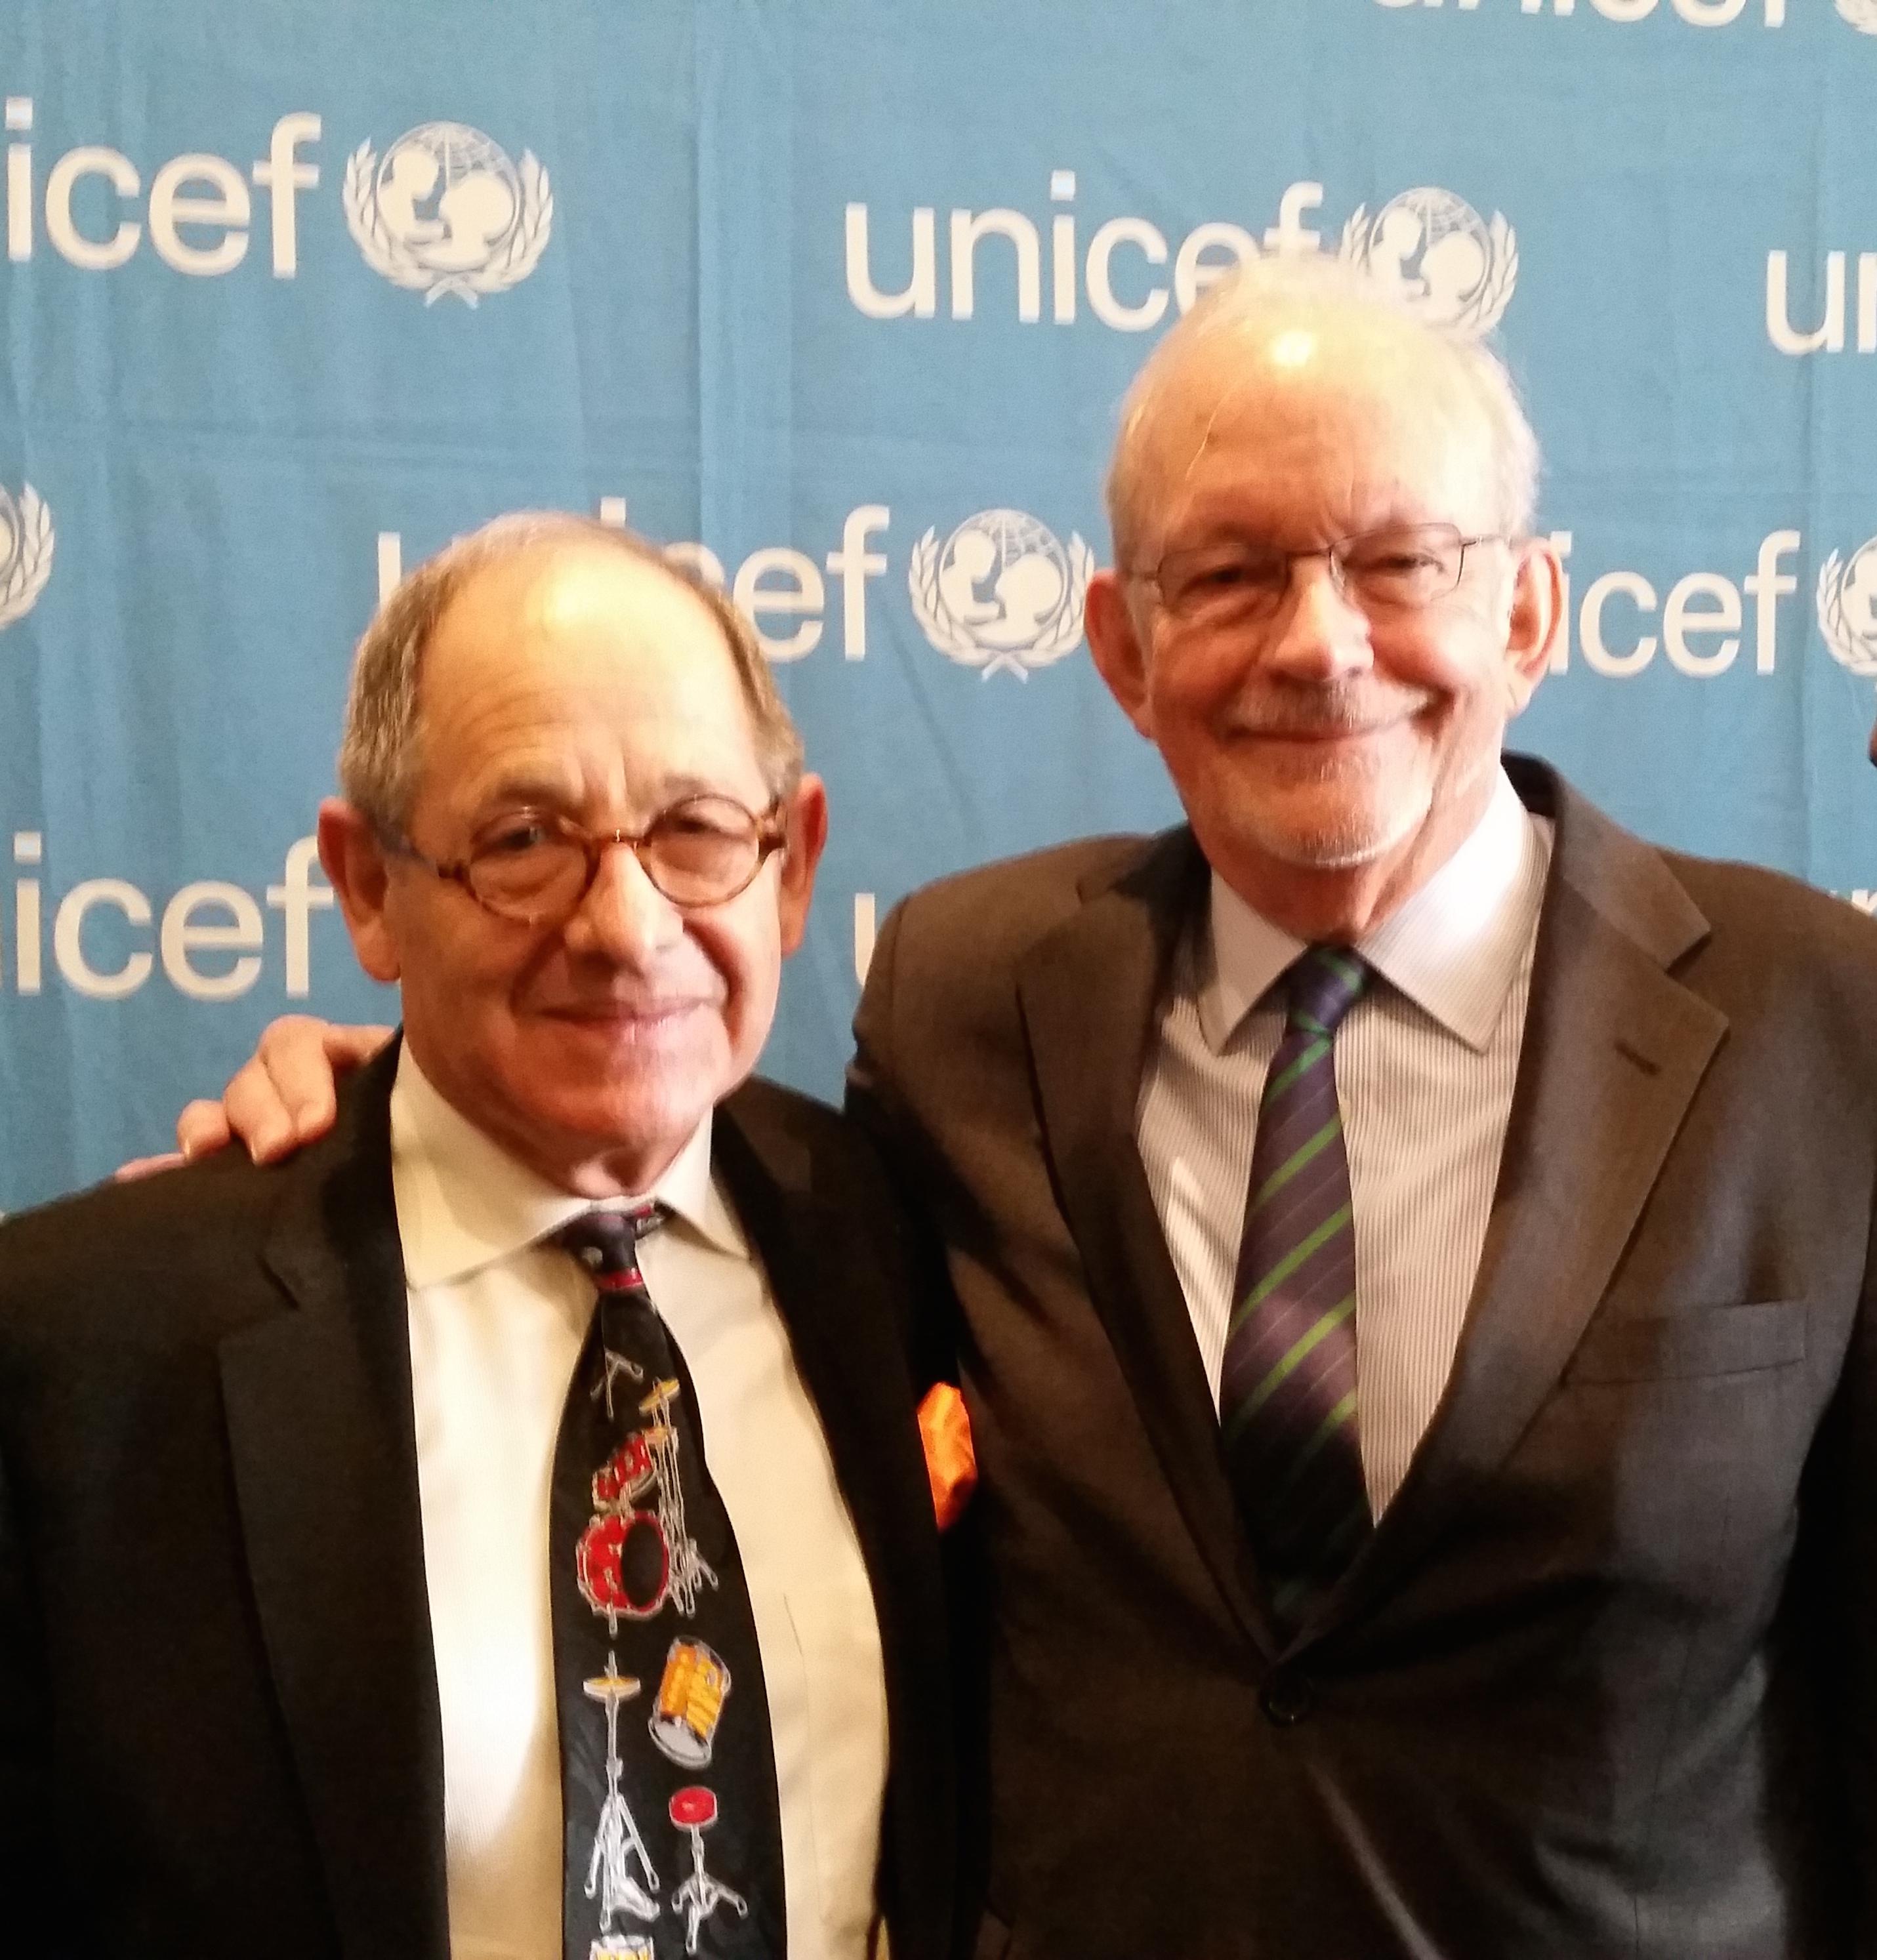 Unicef's 'Imagine' Event in New York  – November 2014